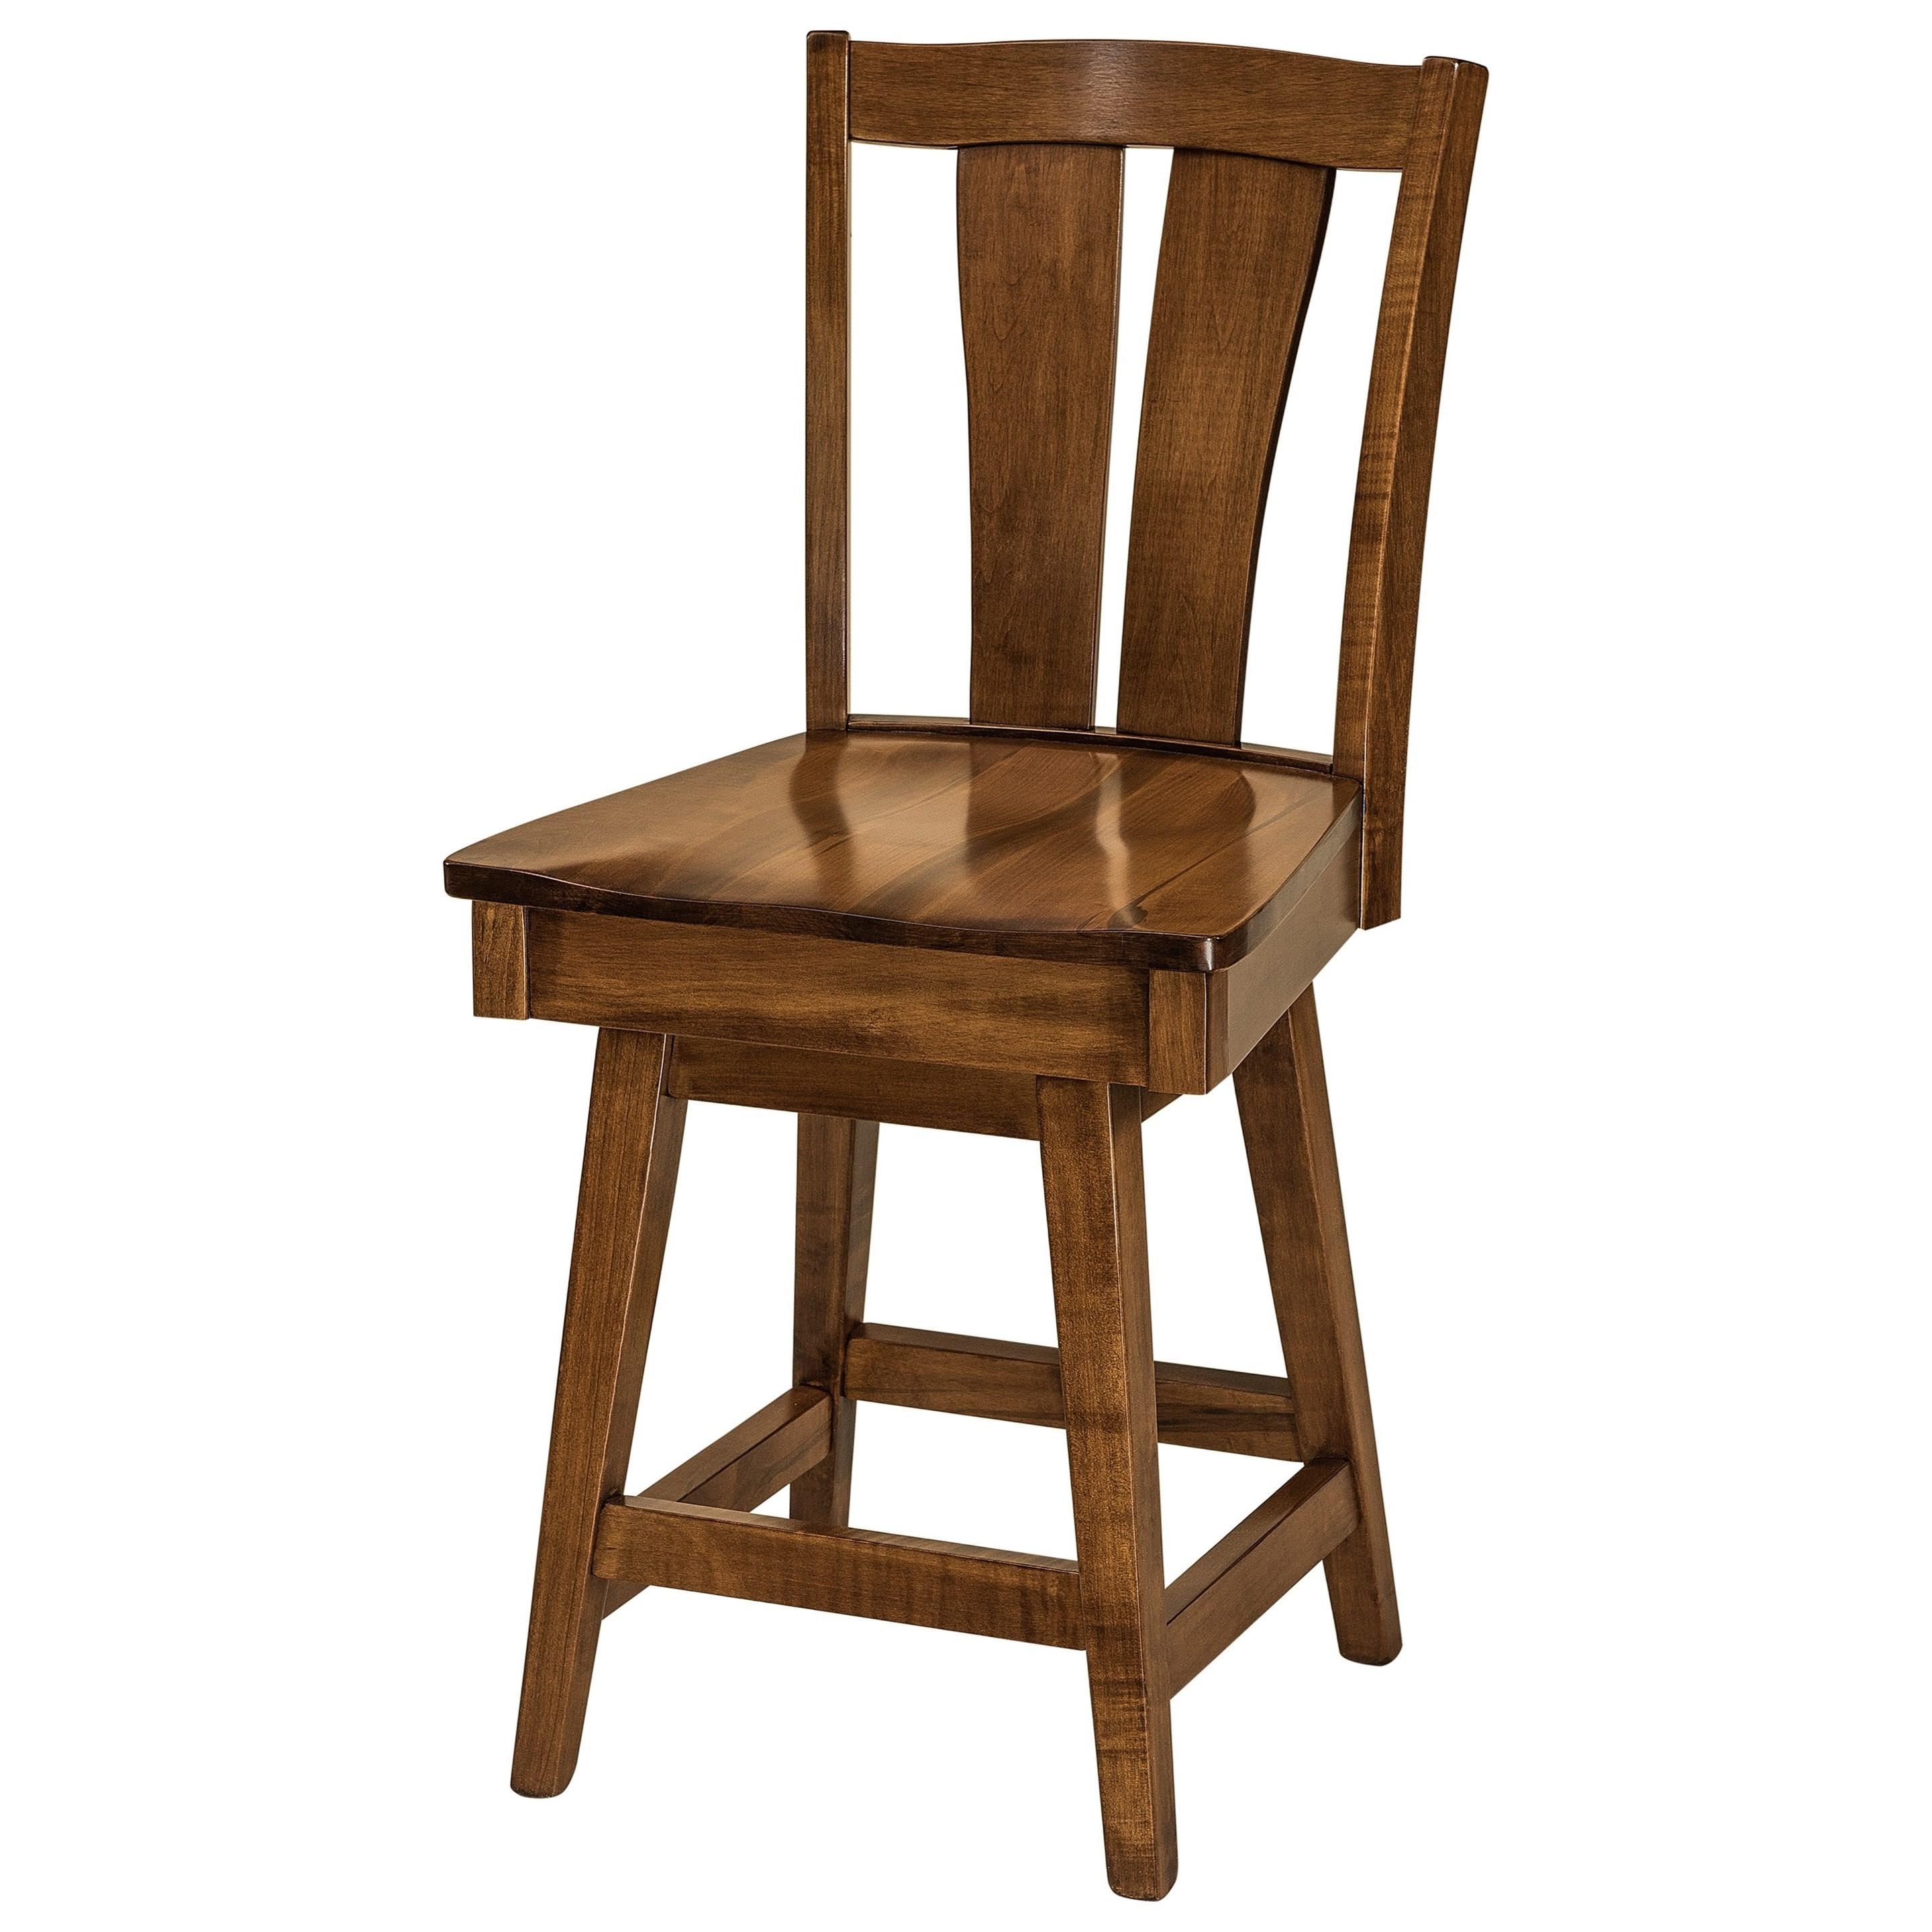 Brawley Swivel Bar Stool - Fabric Seat by F&N Woodworking at Mueller Furniture